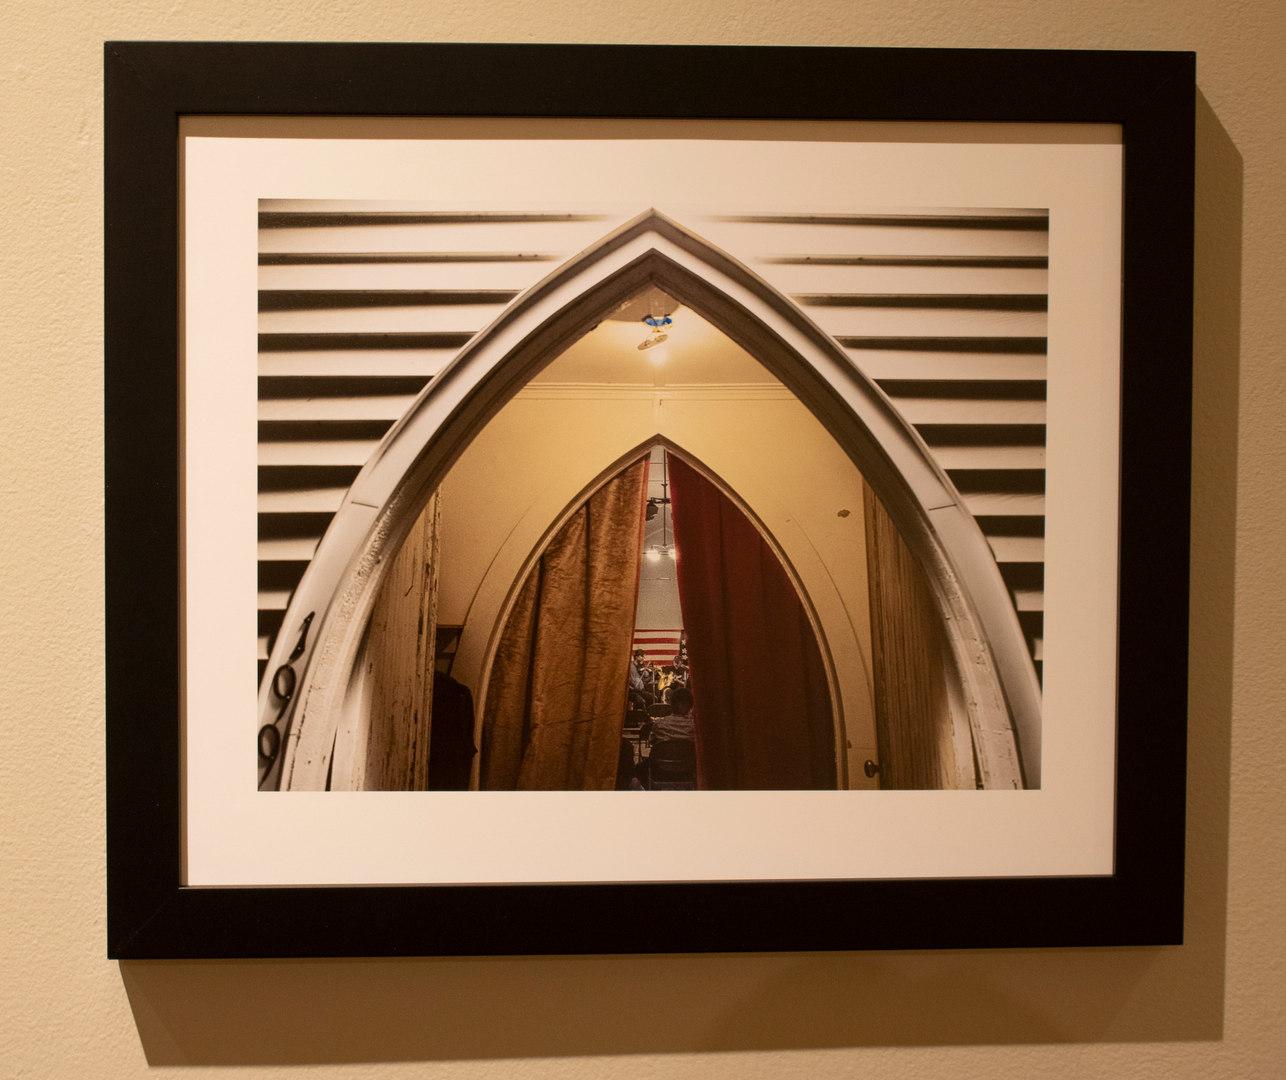 Church of the Sacred Sounds by Richard Krajnyak